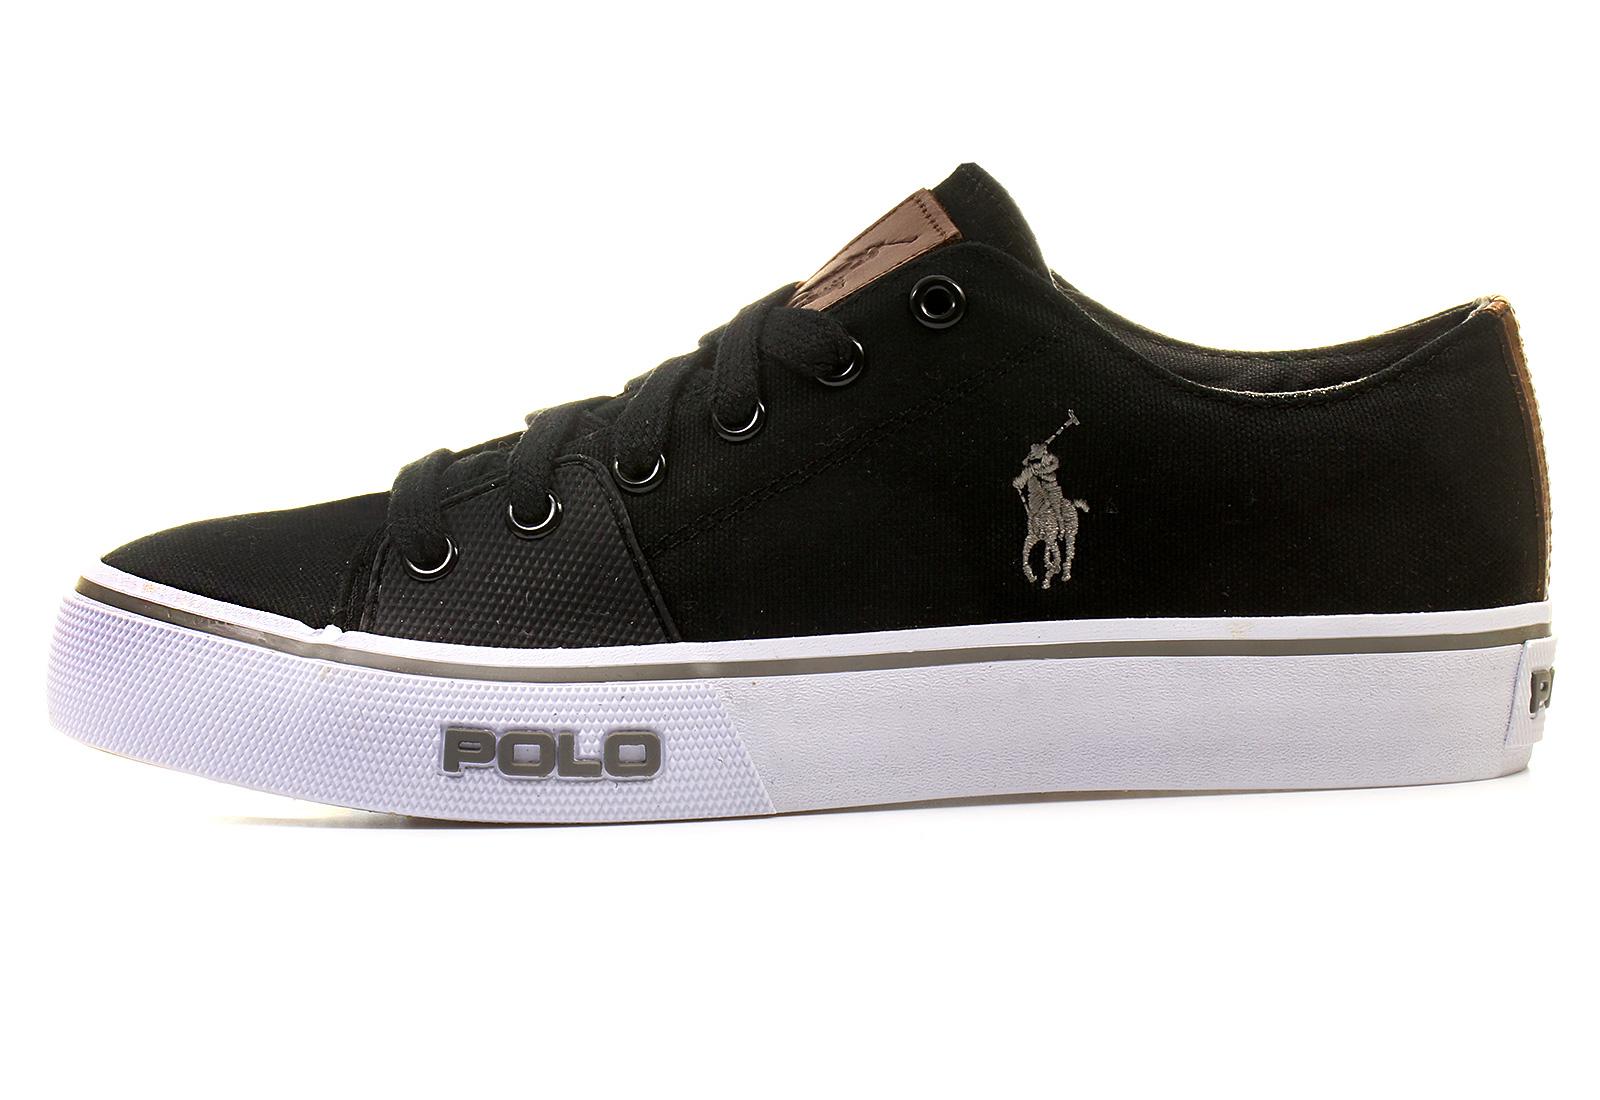 polo ralph lauren shoes cantor low 276 c w0d2x. Black Bedroom Furniture Sets. Home Design Ideas